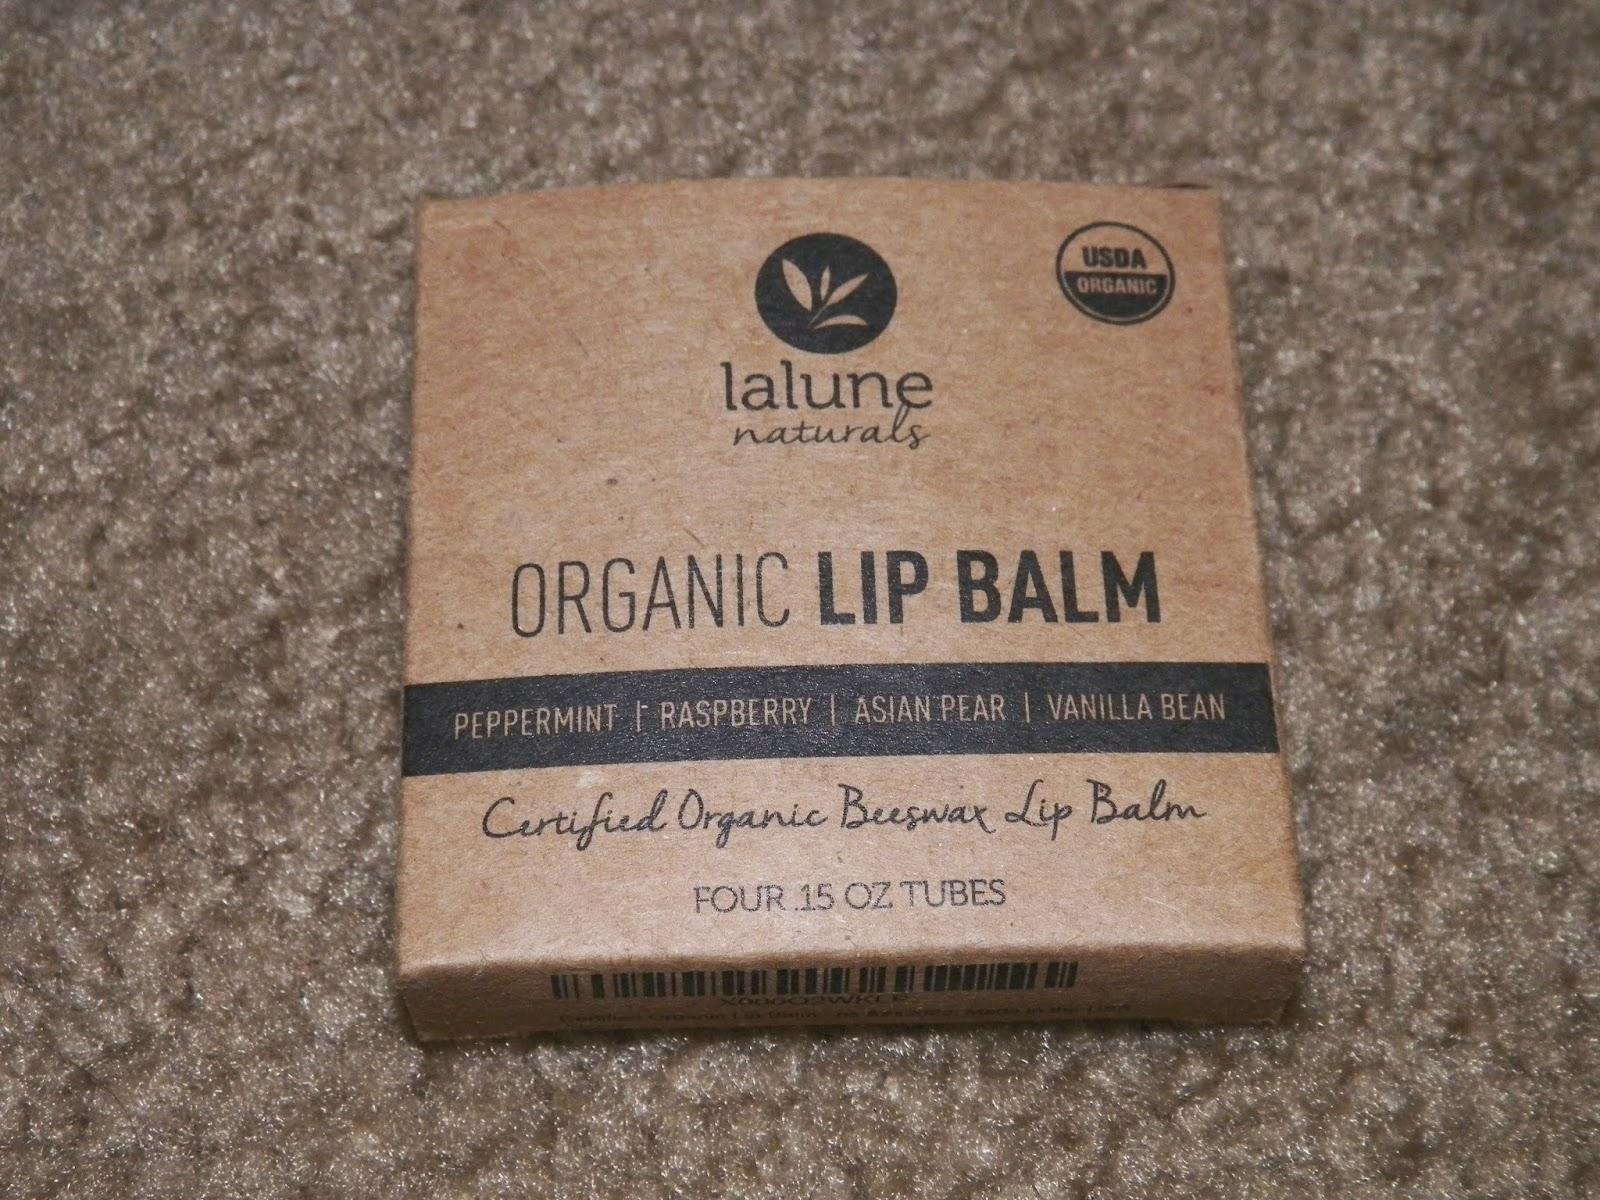 La_Lune_Naturals_Organic_Lip_Balm.jpg